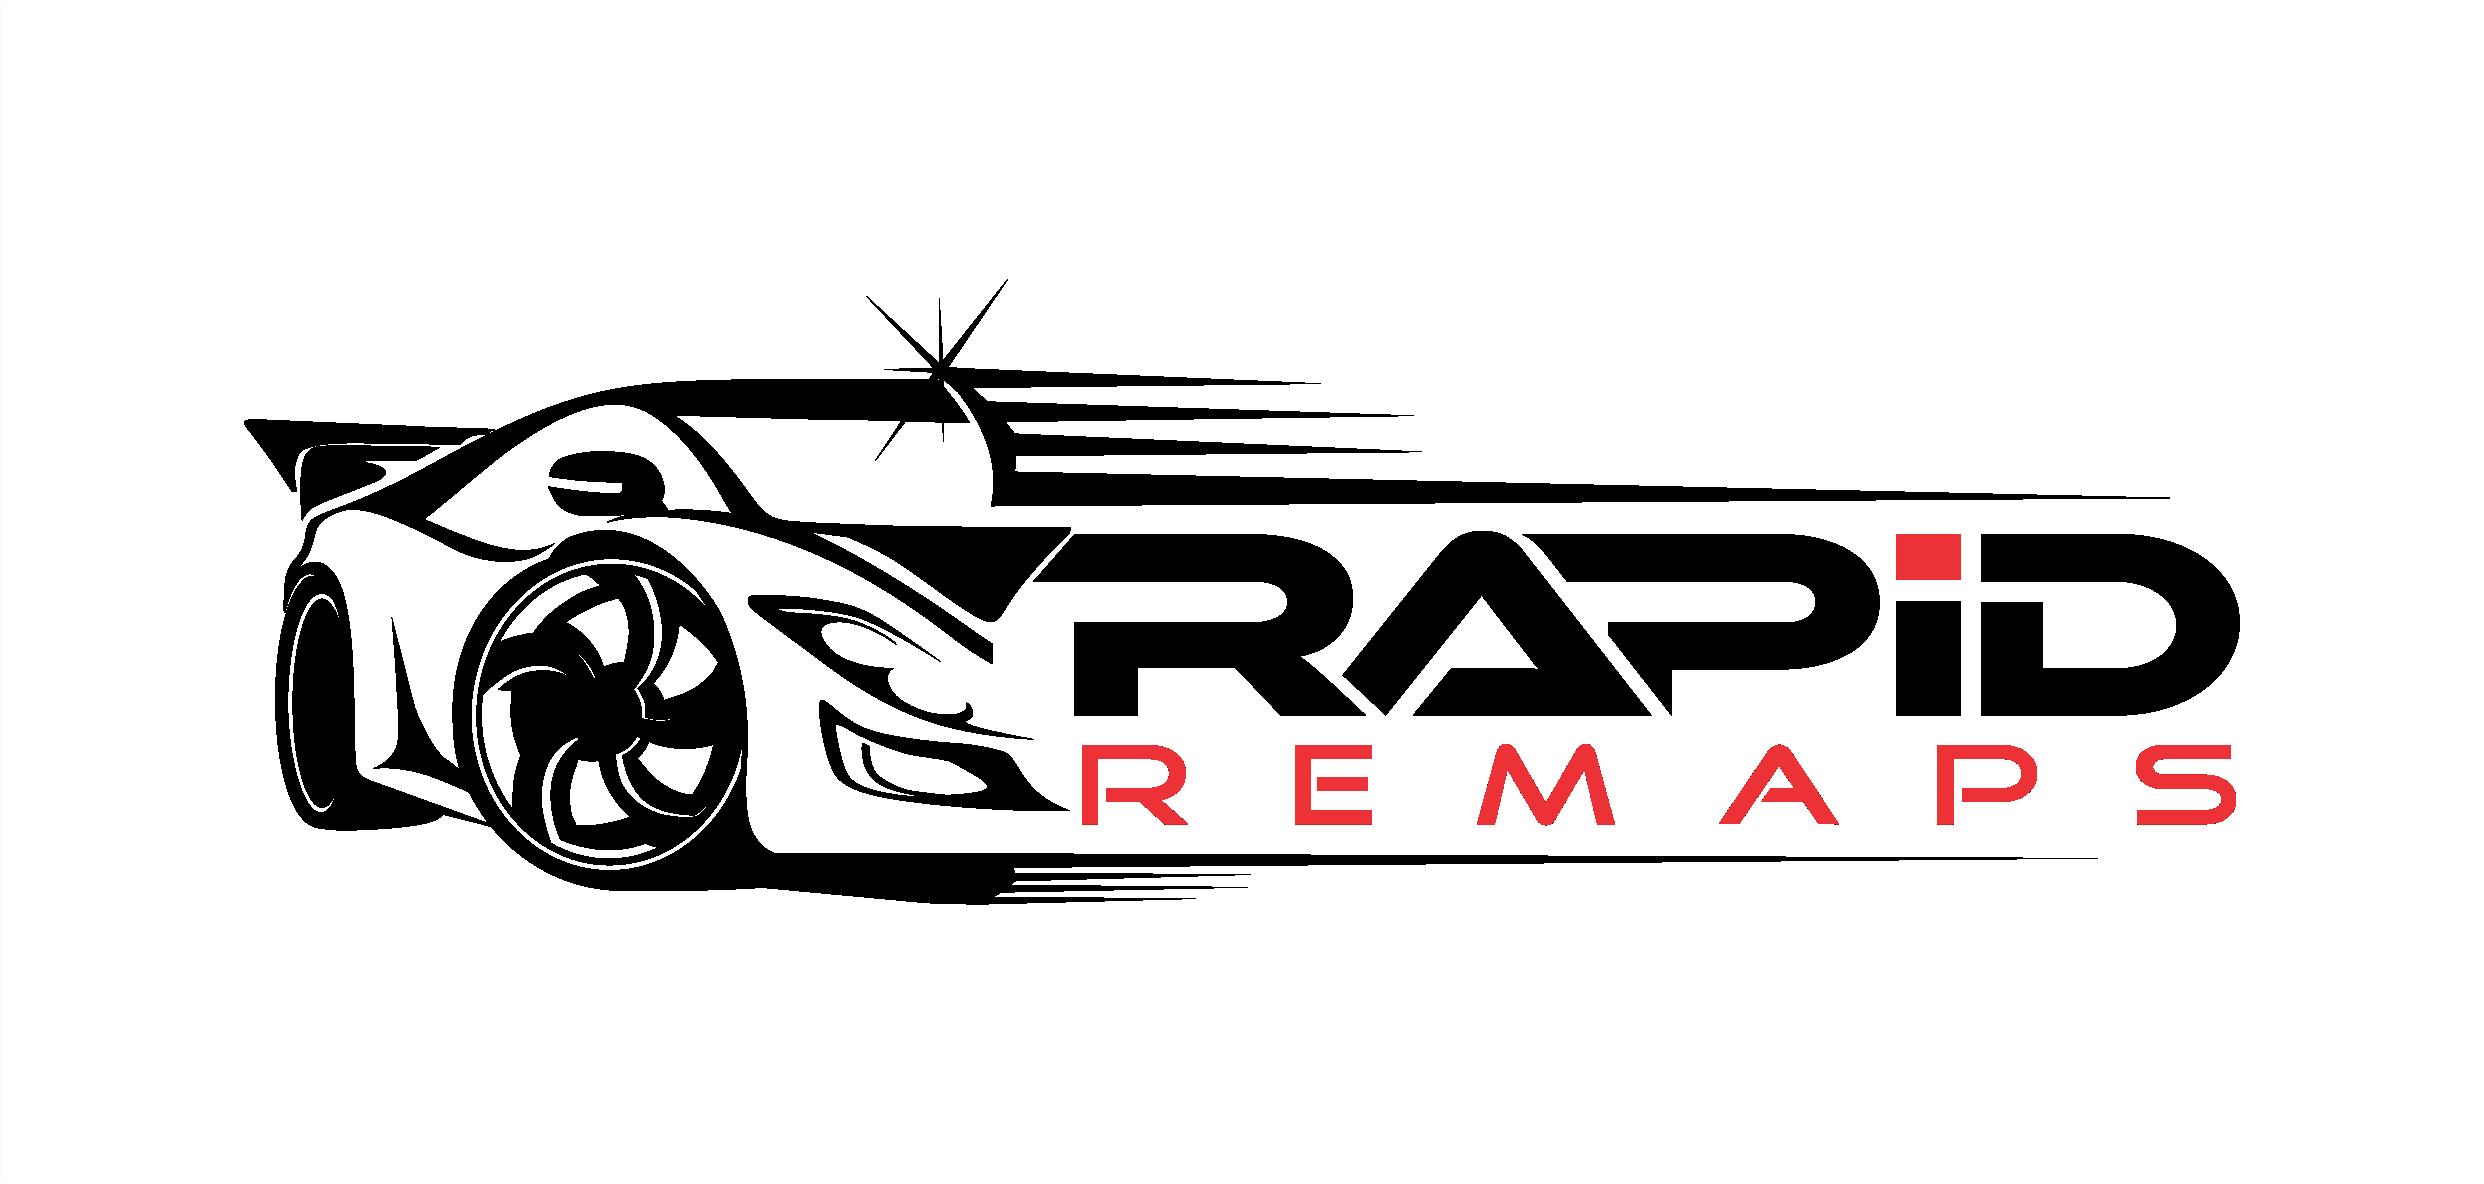 RAPID remaps